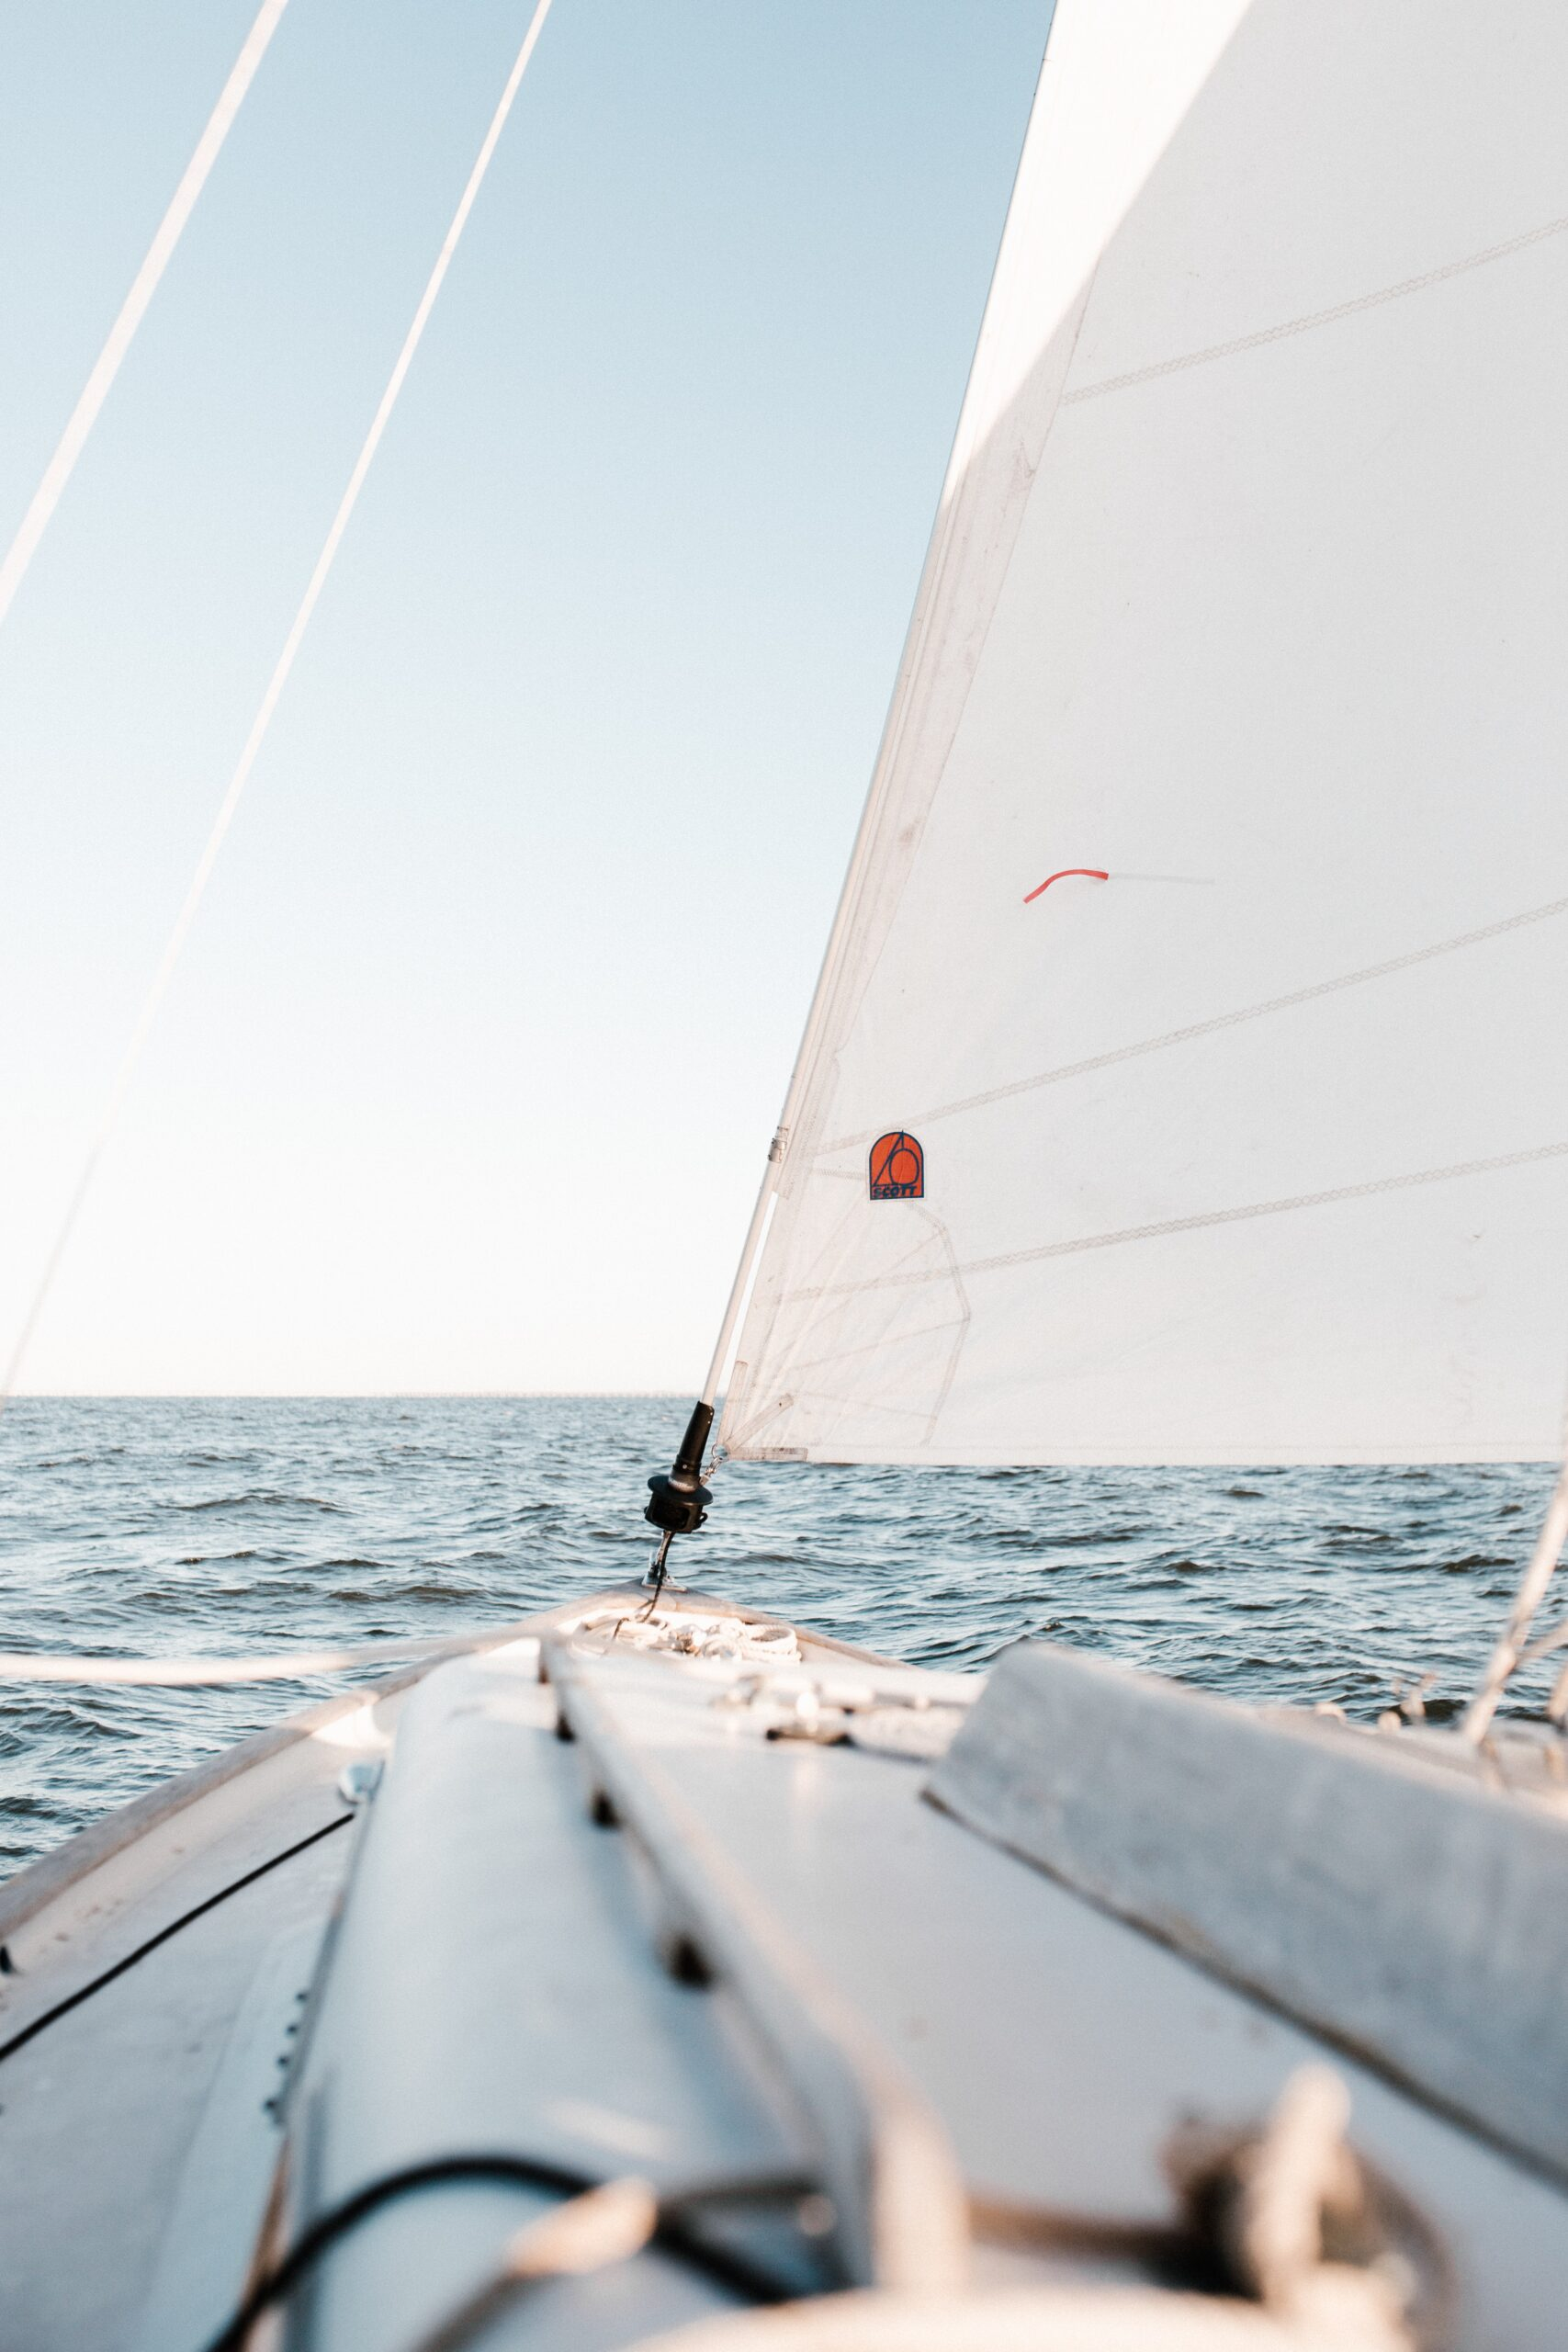 andrew-neel-Hoisted Main sale and ocean water horizon-unsplash